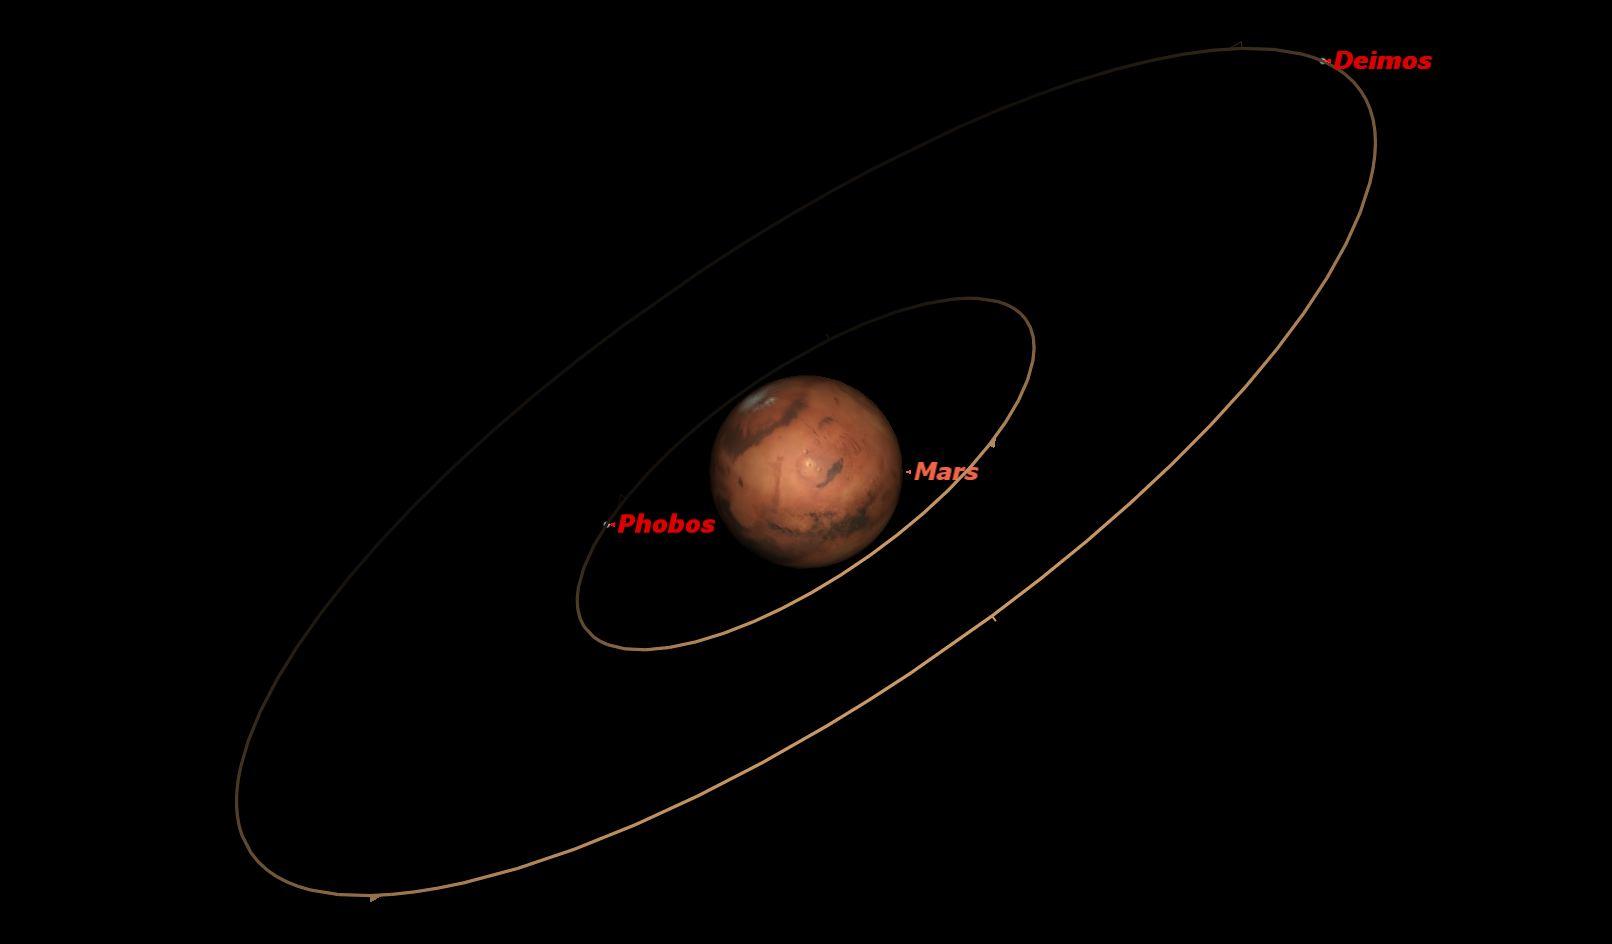 Mars, April 2014